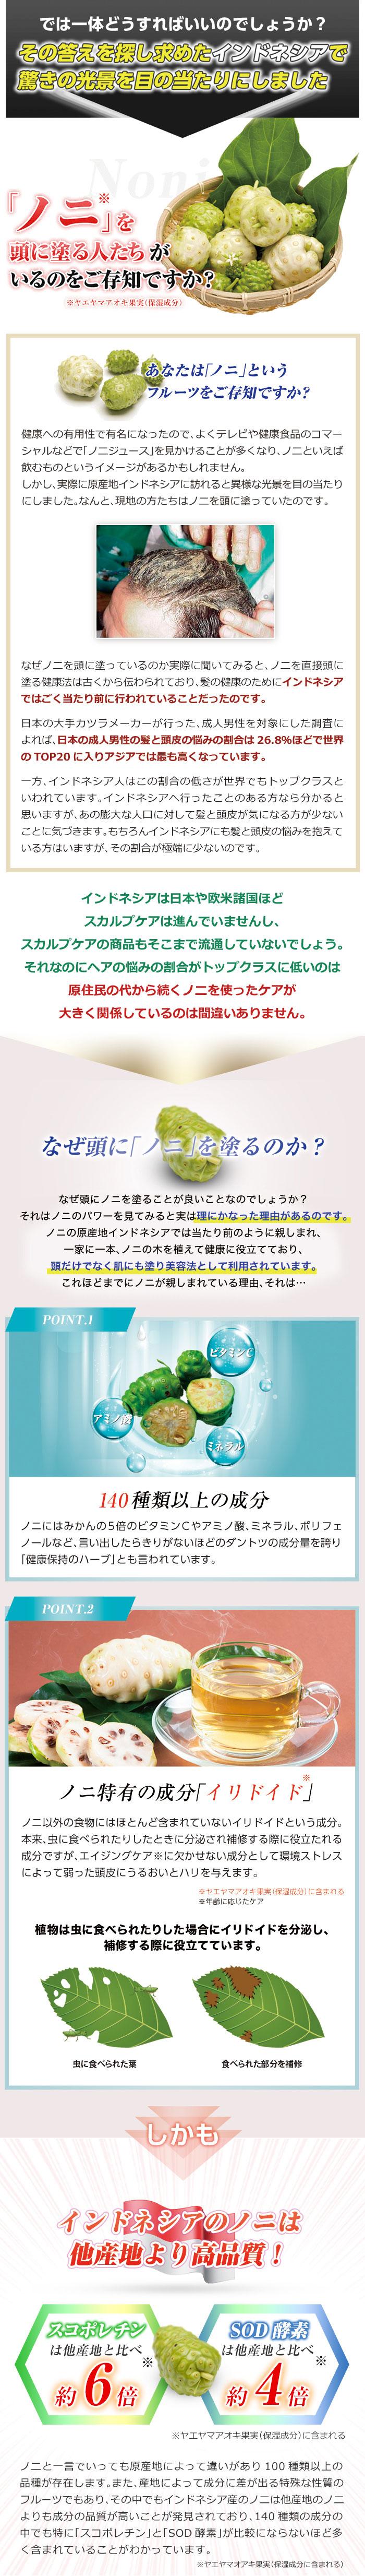 商品画像3-2